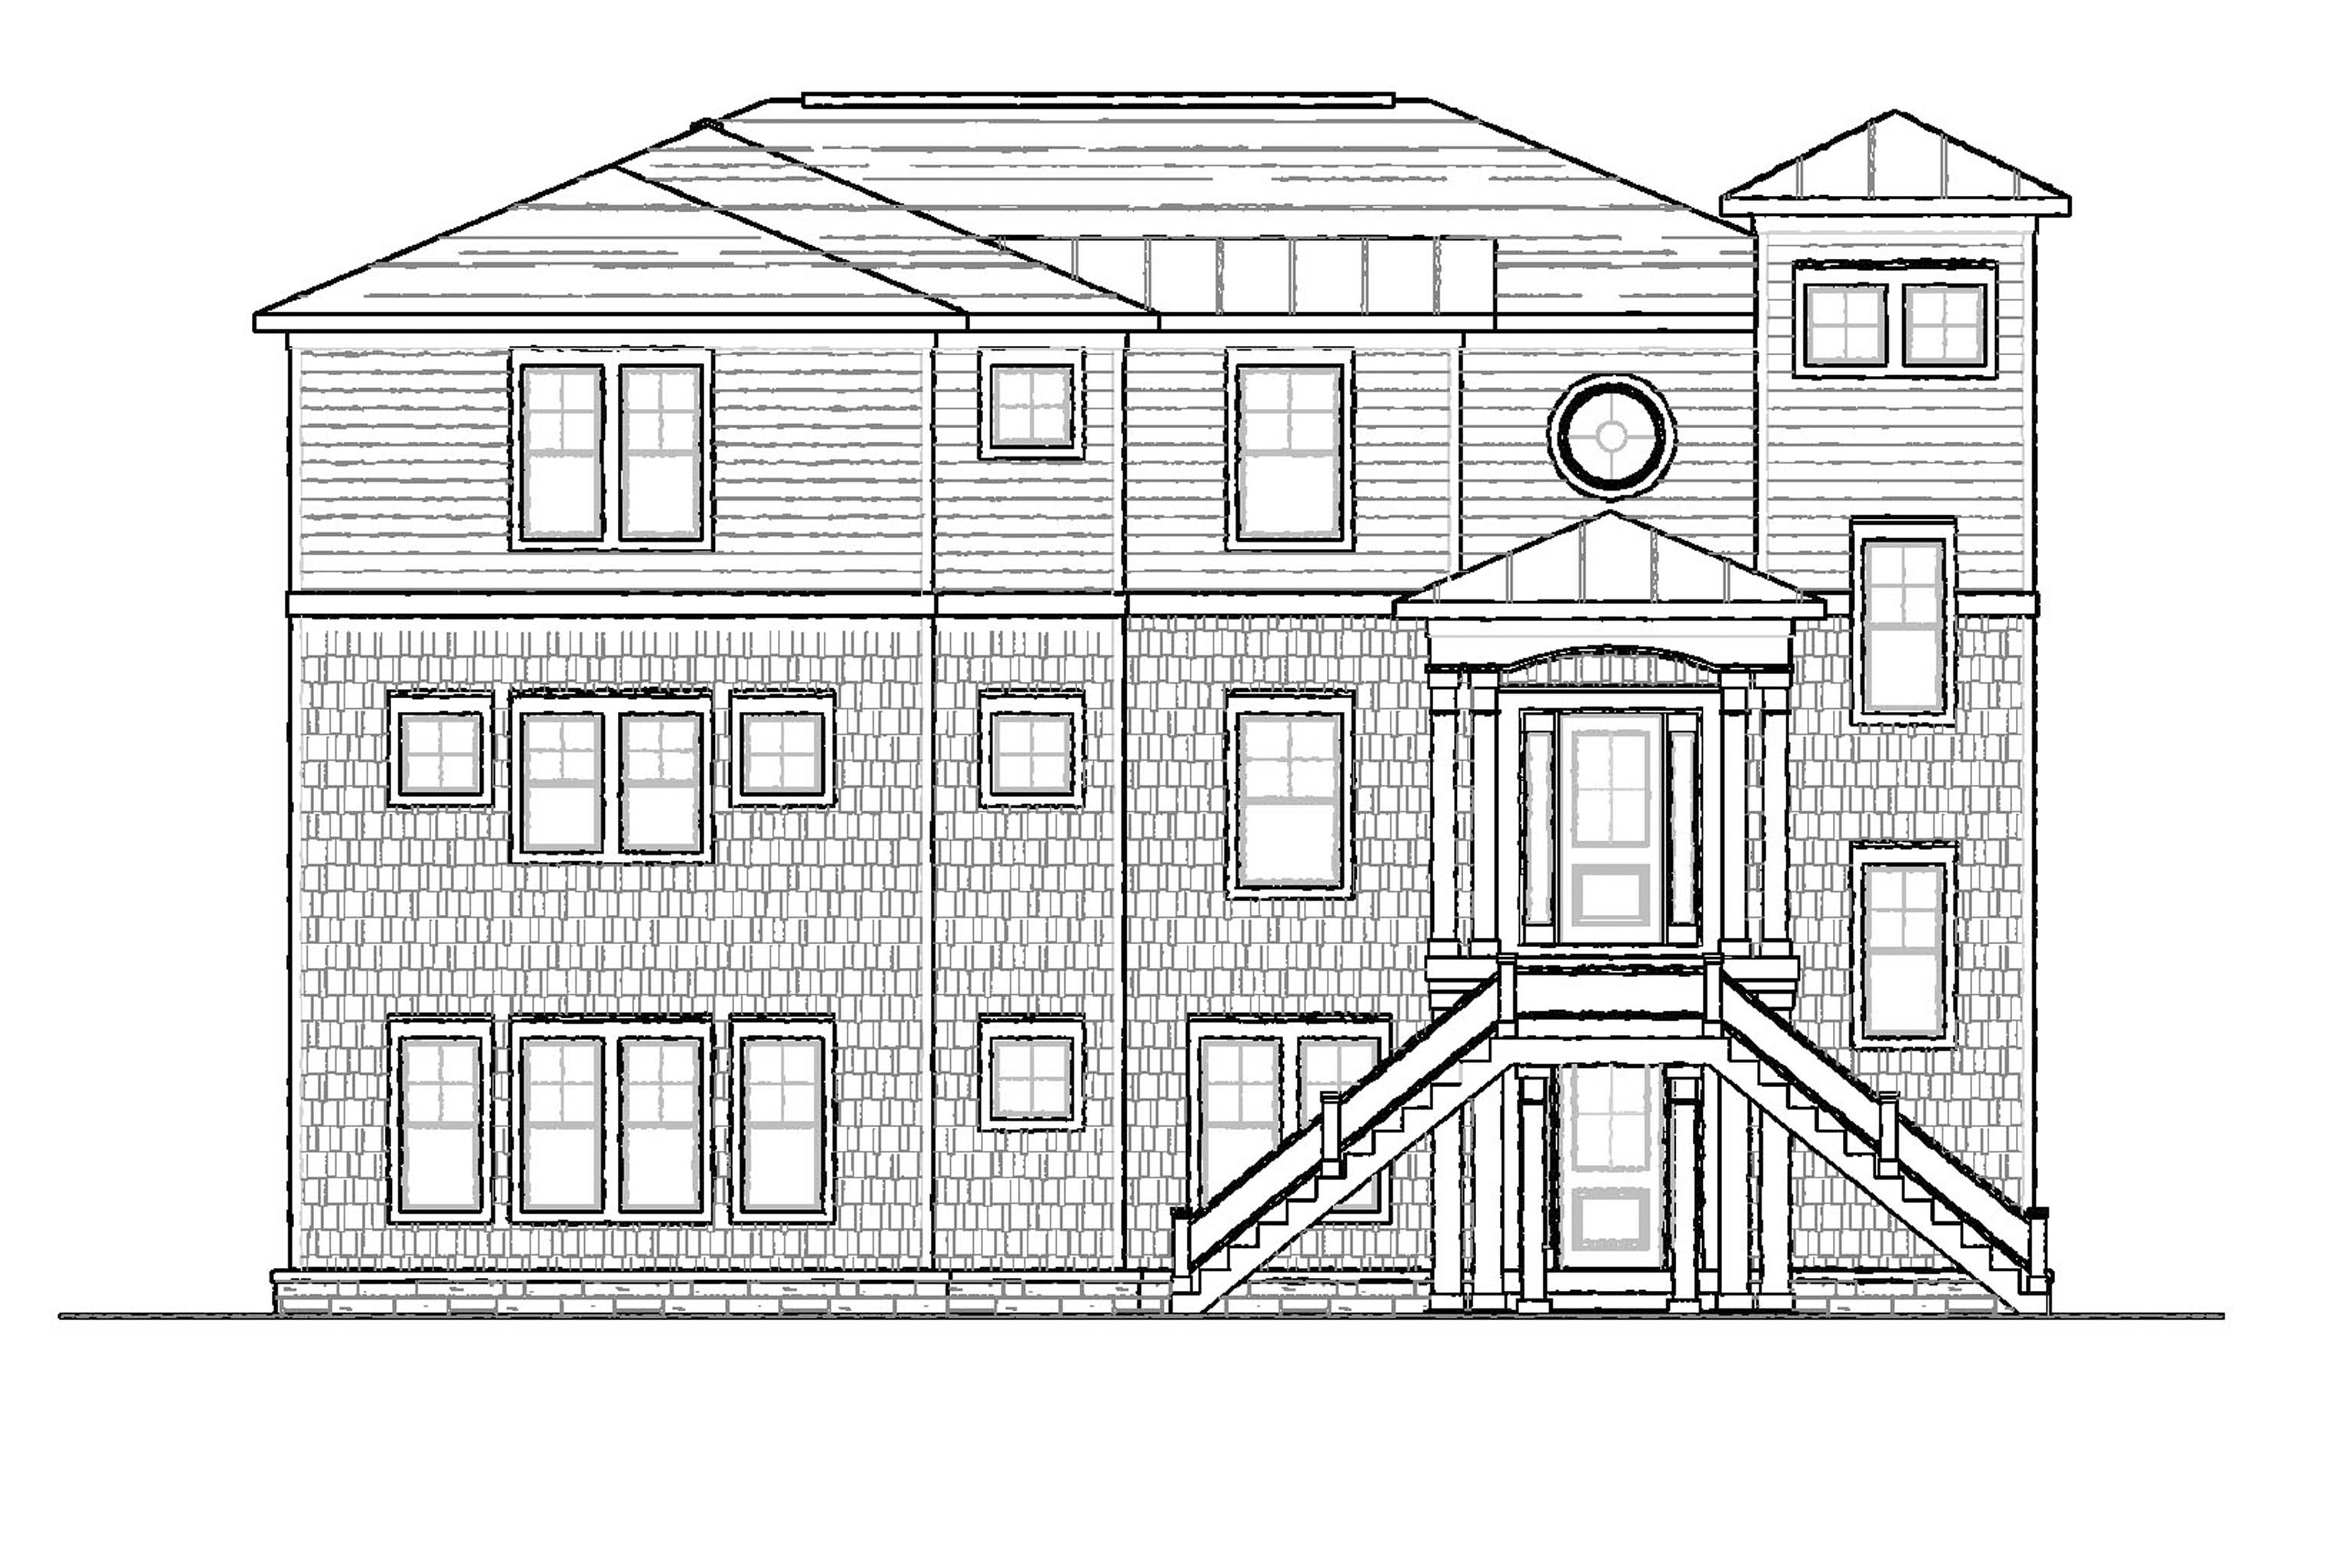 House Plan 225 - Hollies